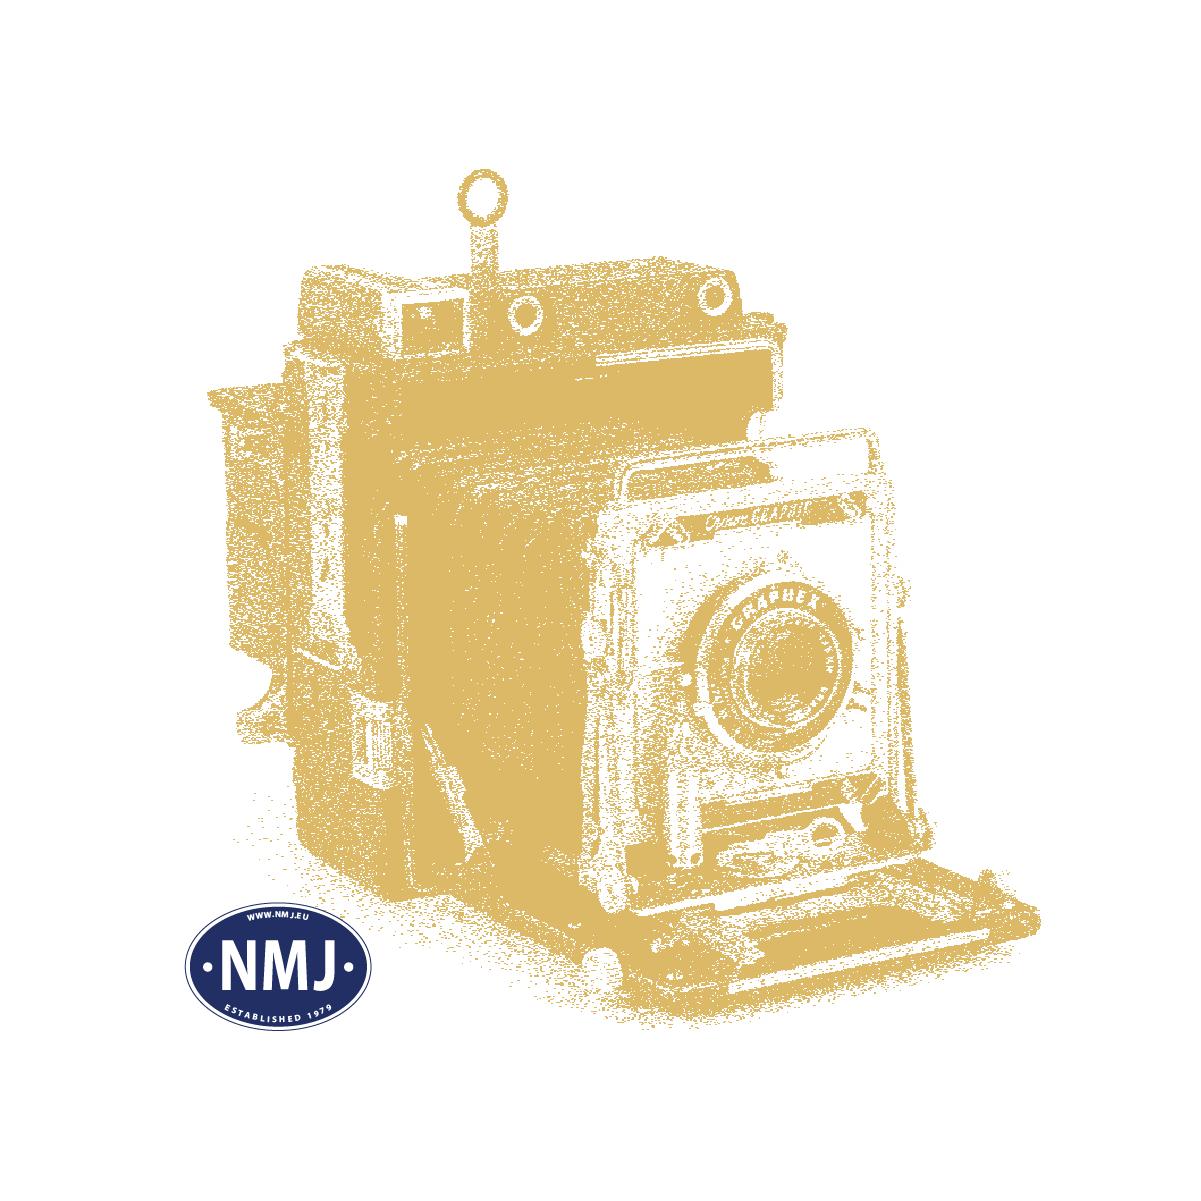 NMJT90402 - NMJ Topline SNCB 202003, DCC m/ Lyd